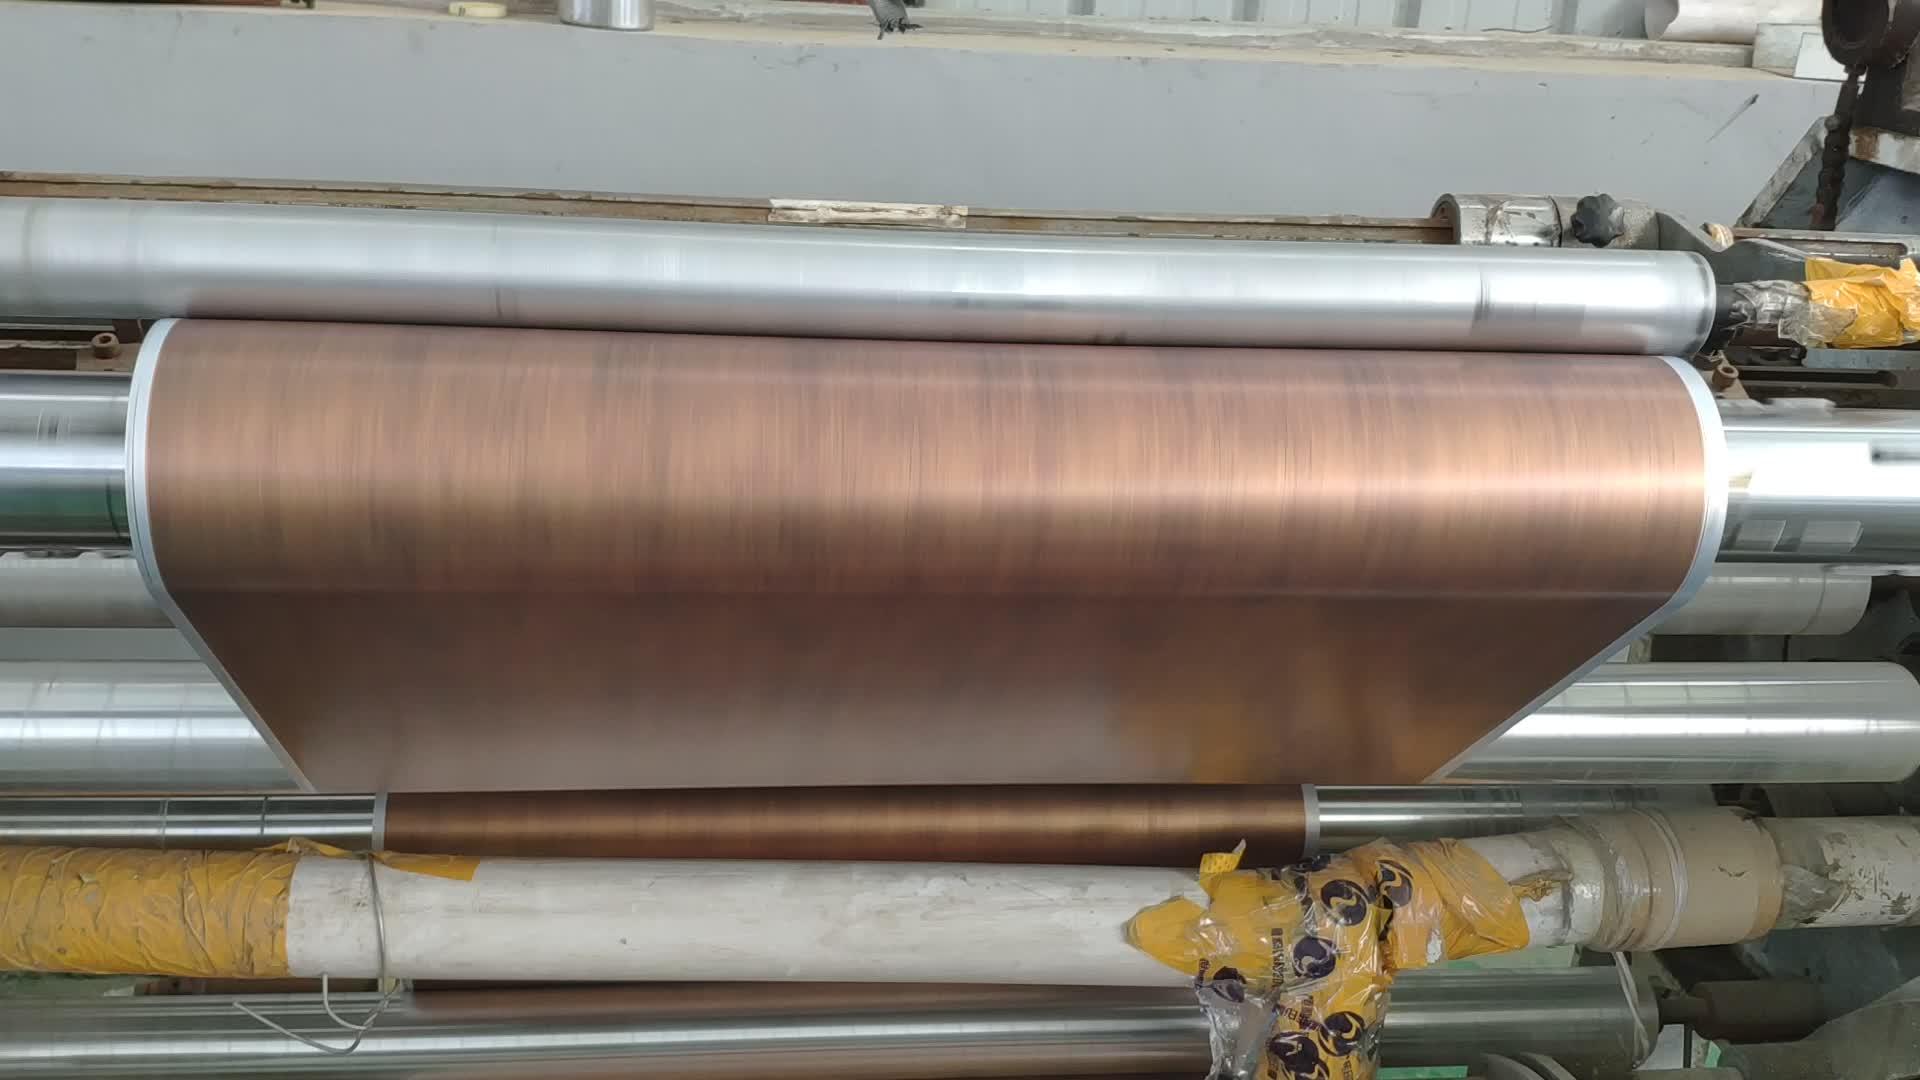 PET Thermal Transfer Metallic Rose Gold Hot Stamping Foil